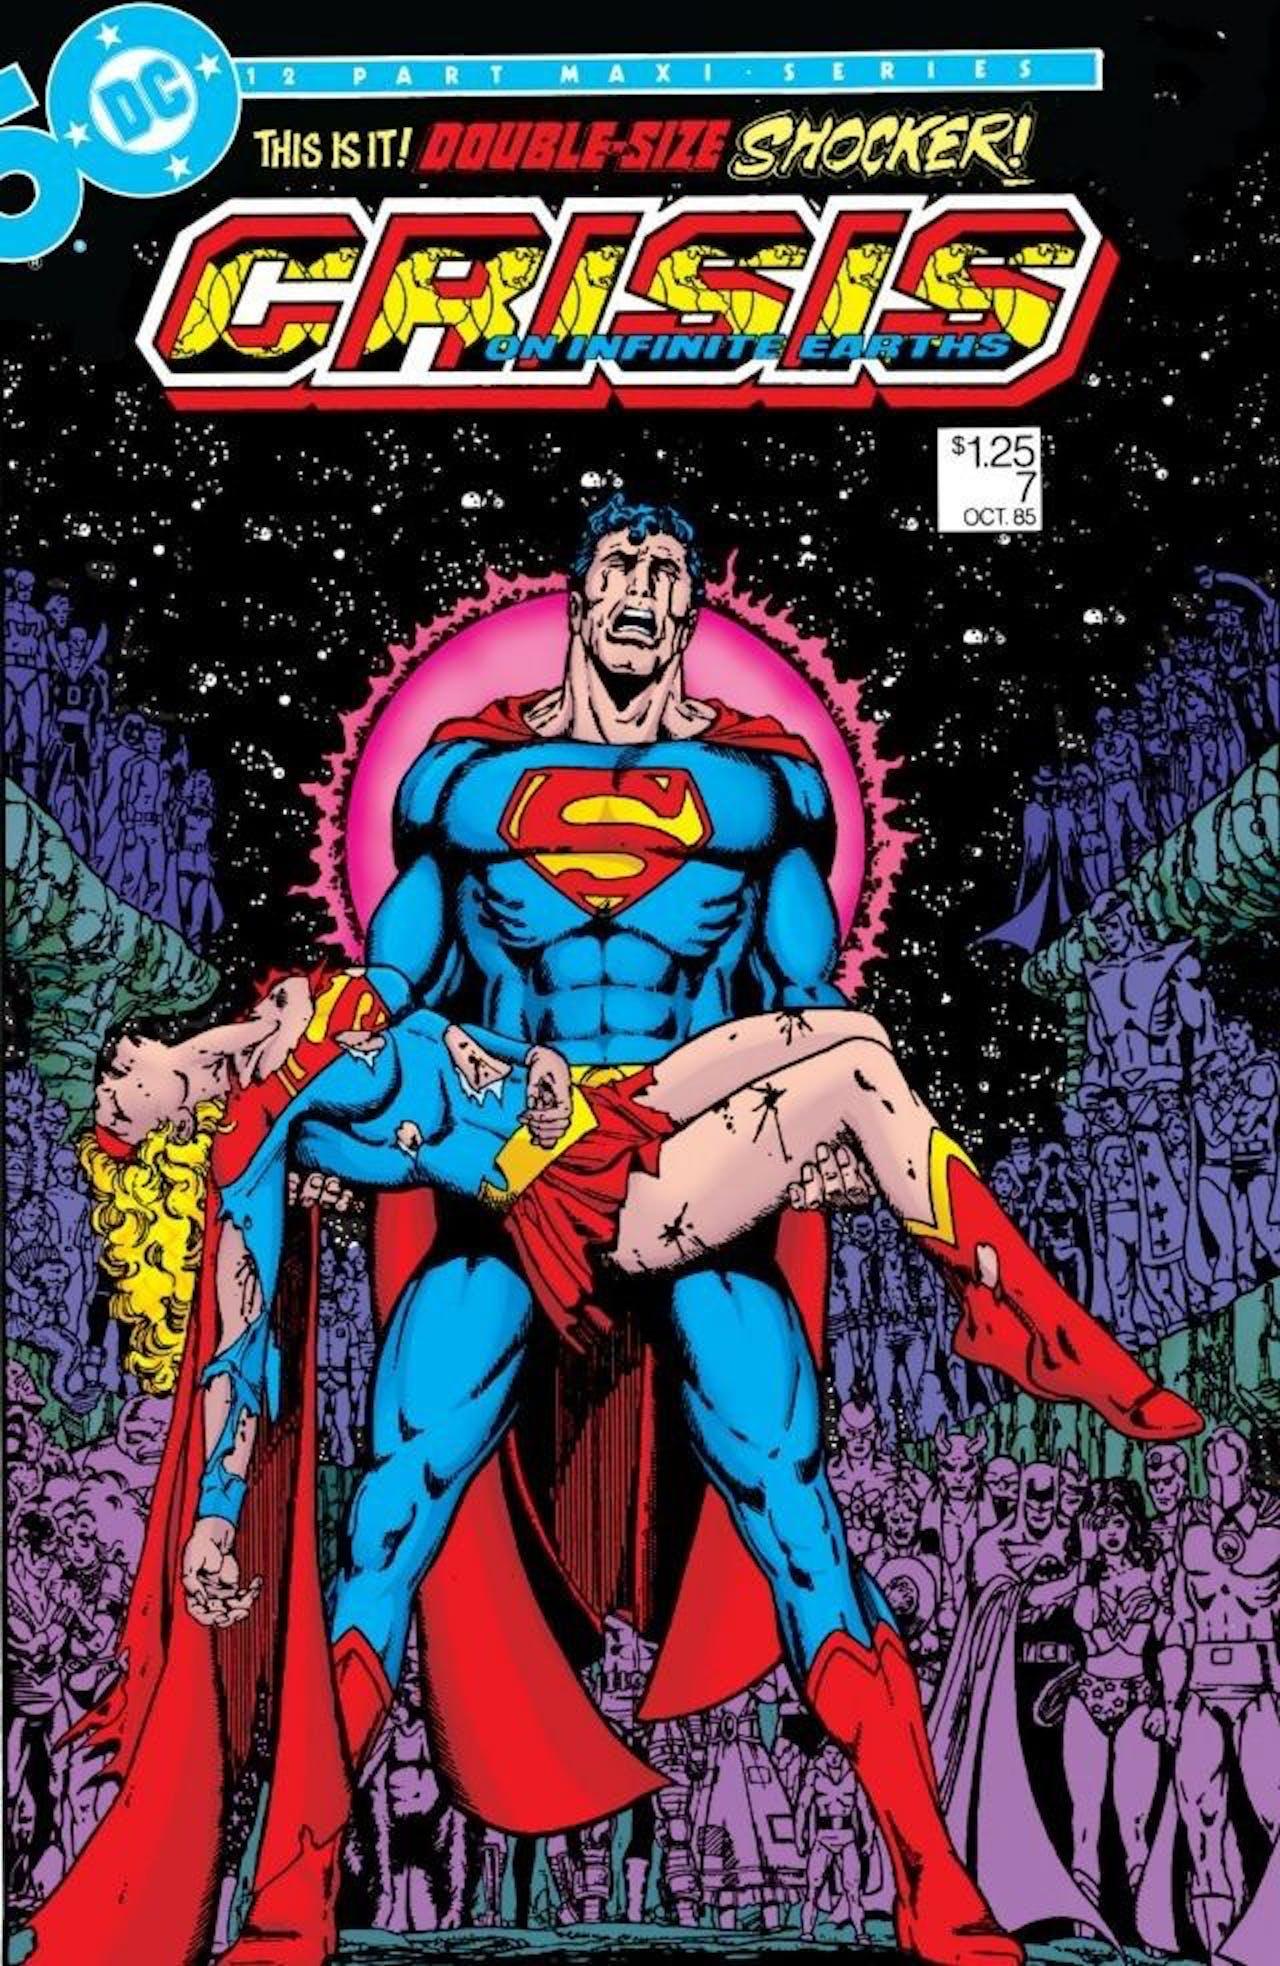 Supergirl Crisis on Infinite Earths